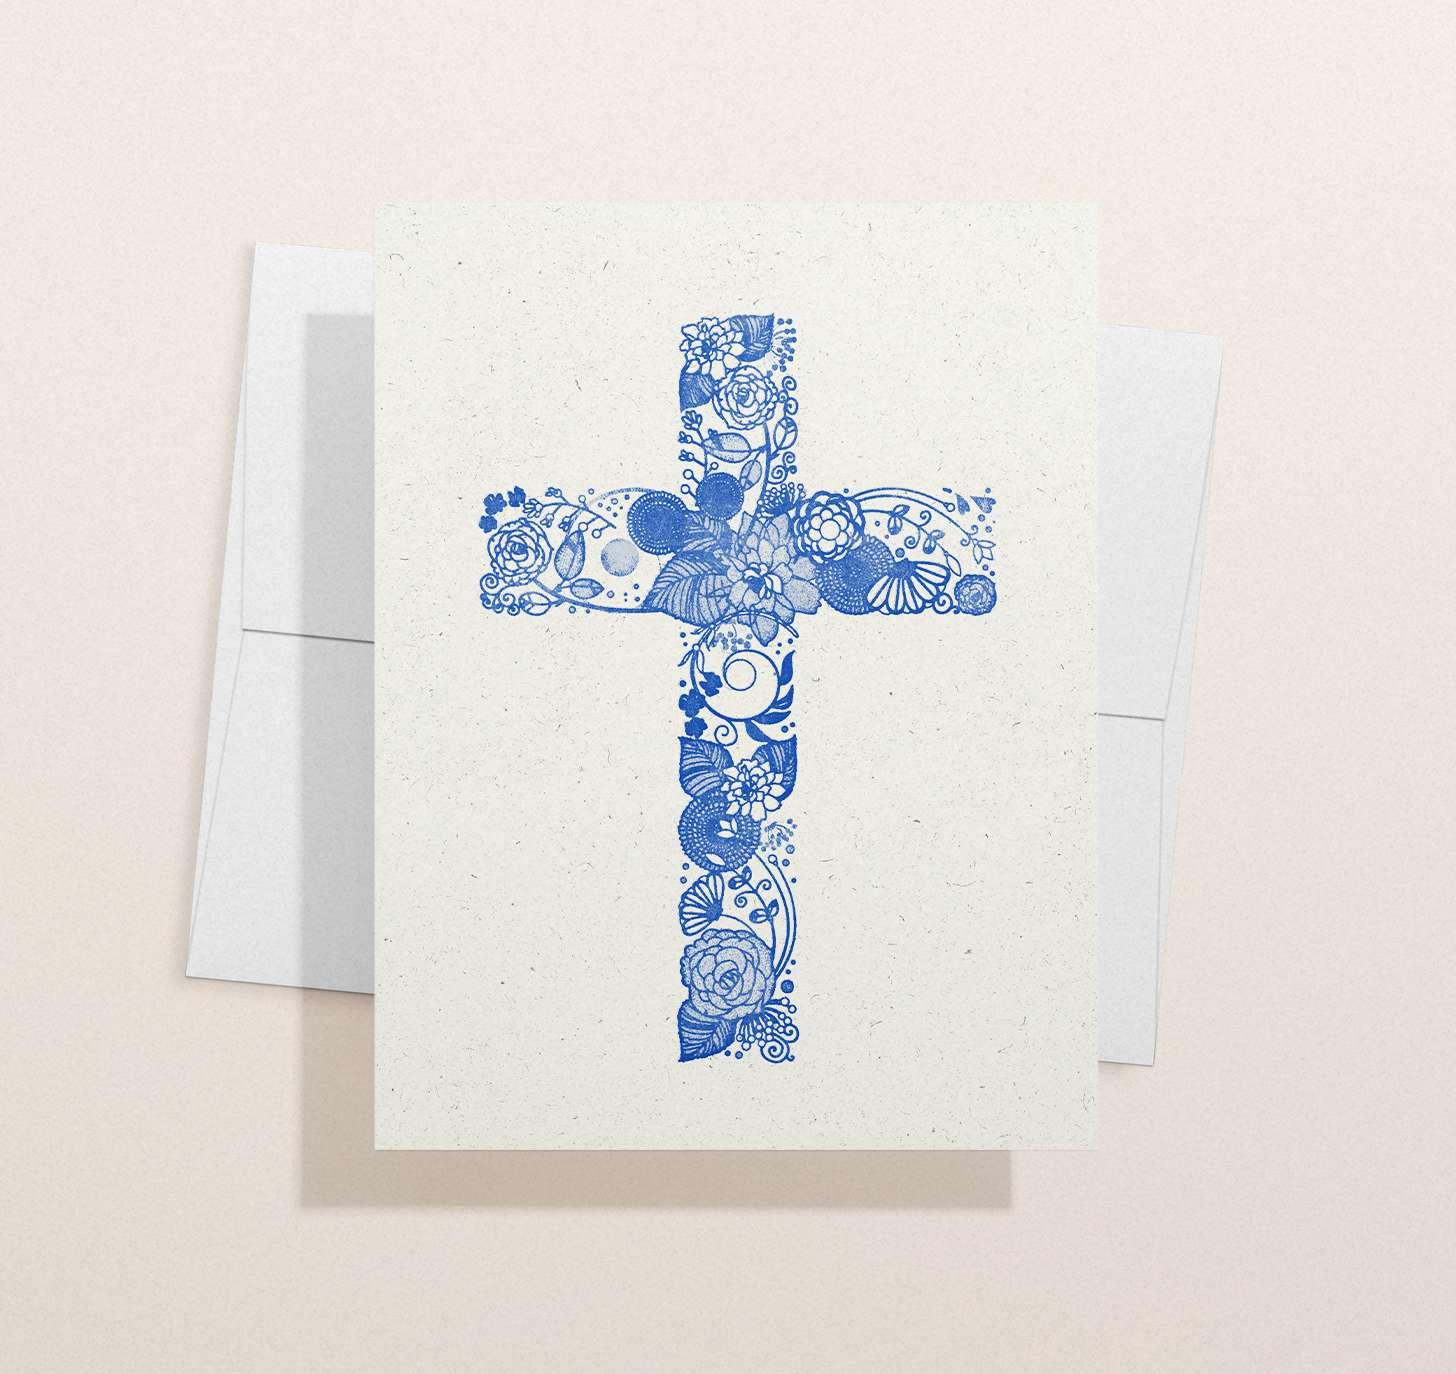 Blue floral cross design with envelope